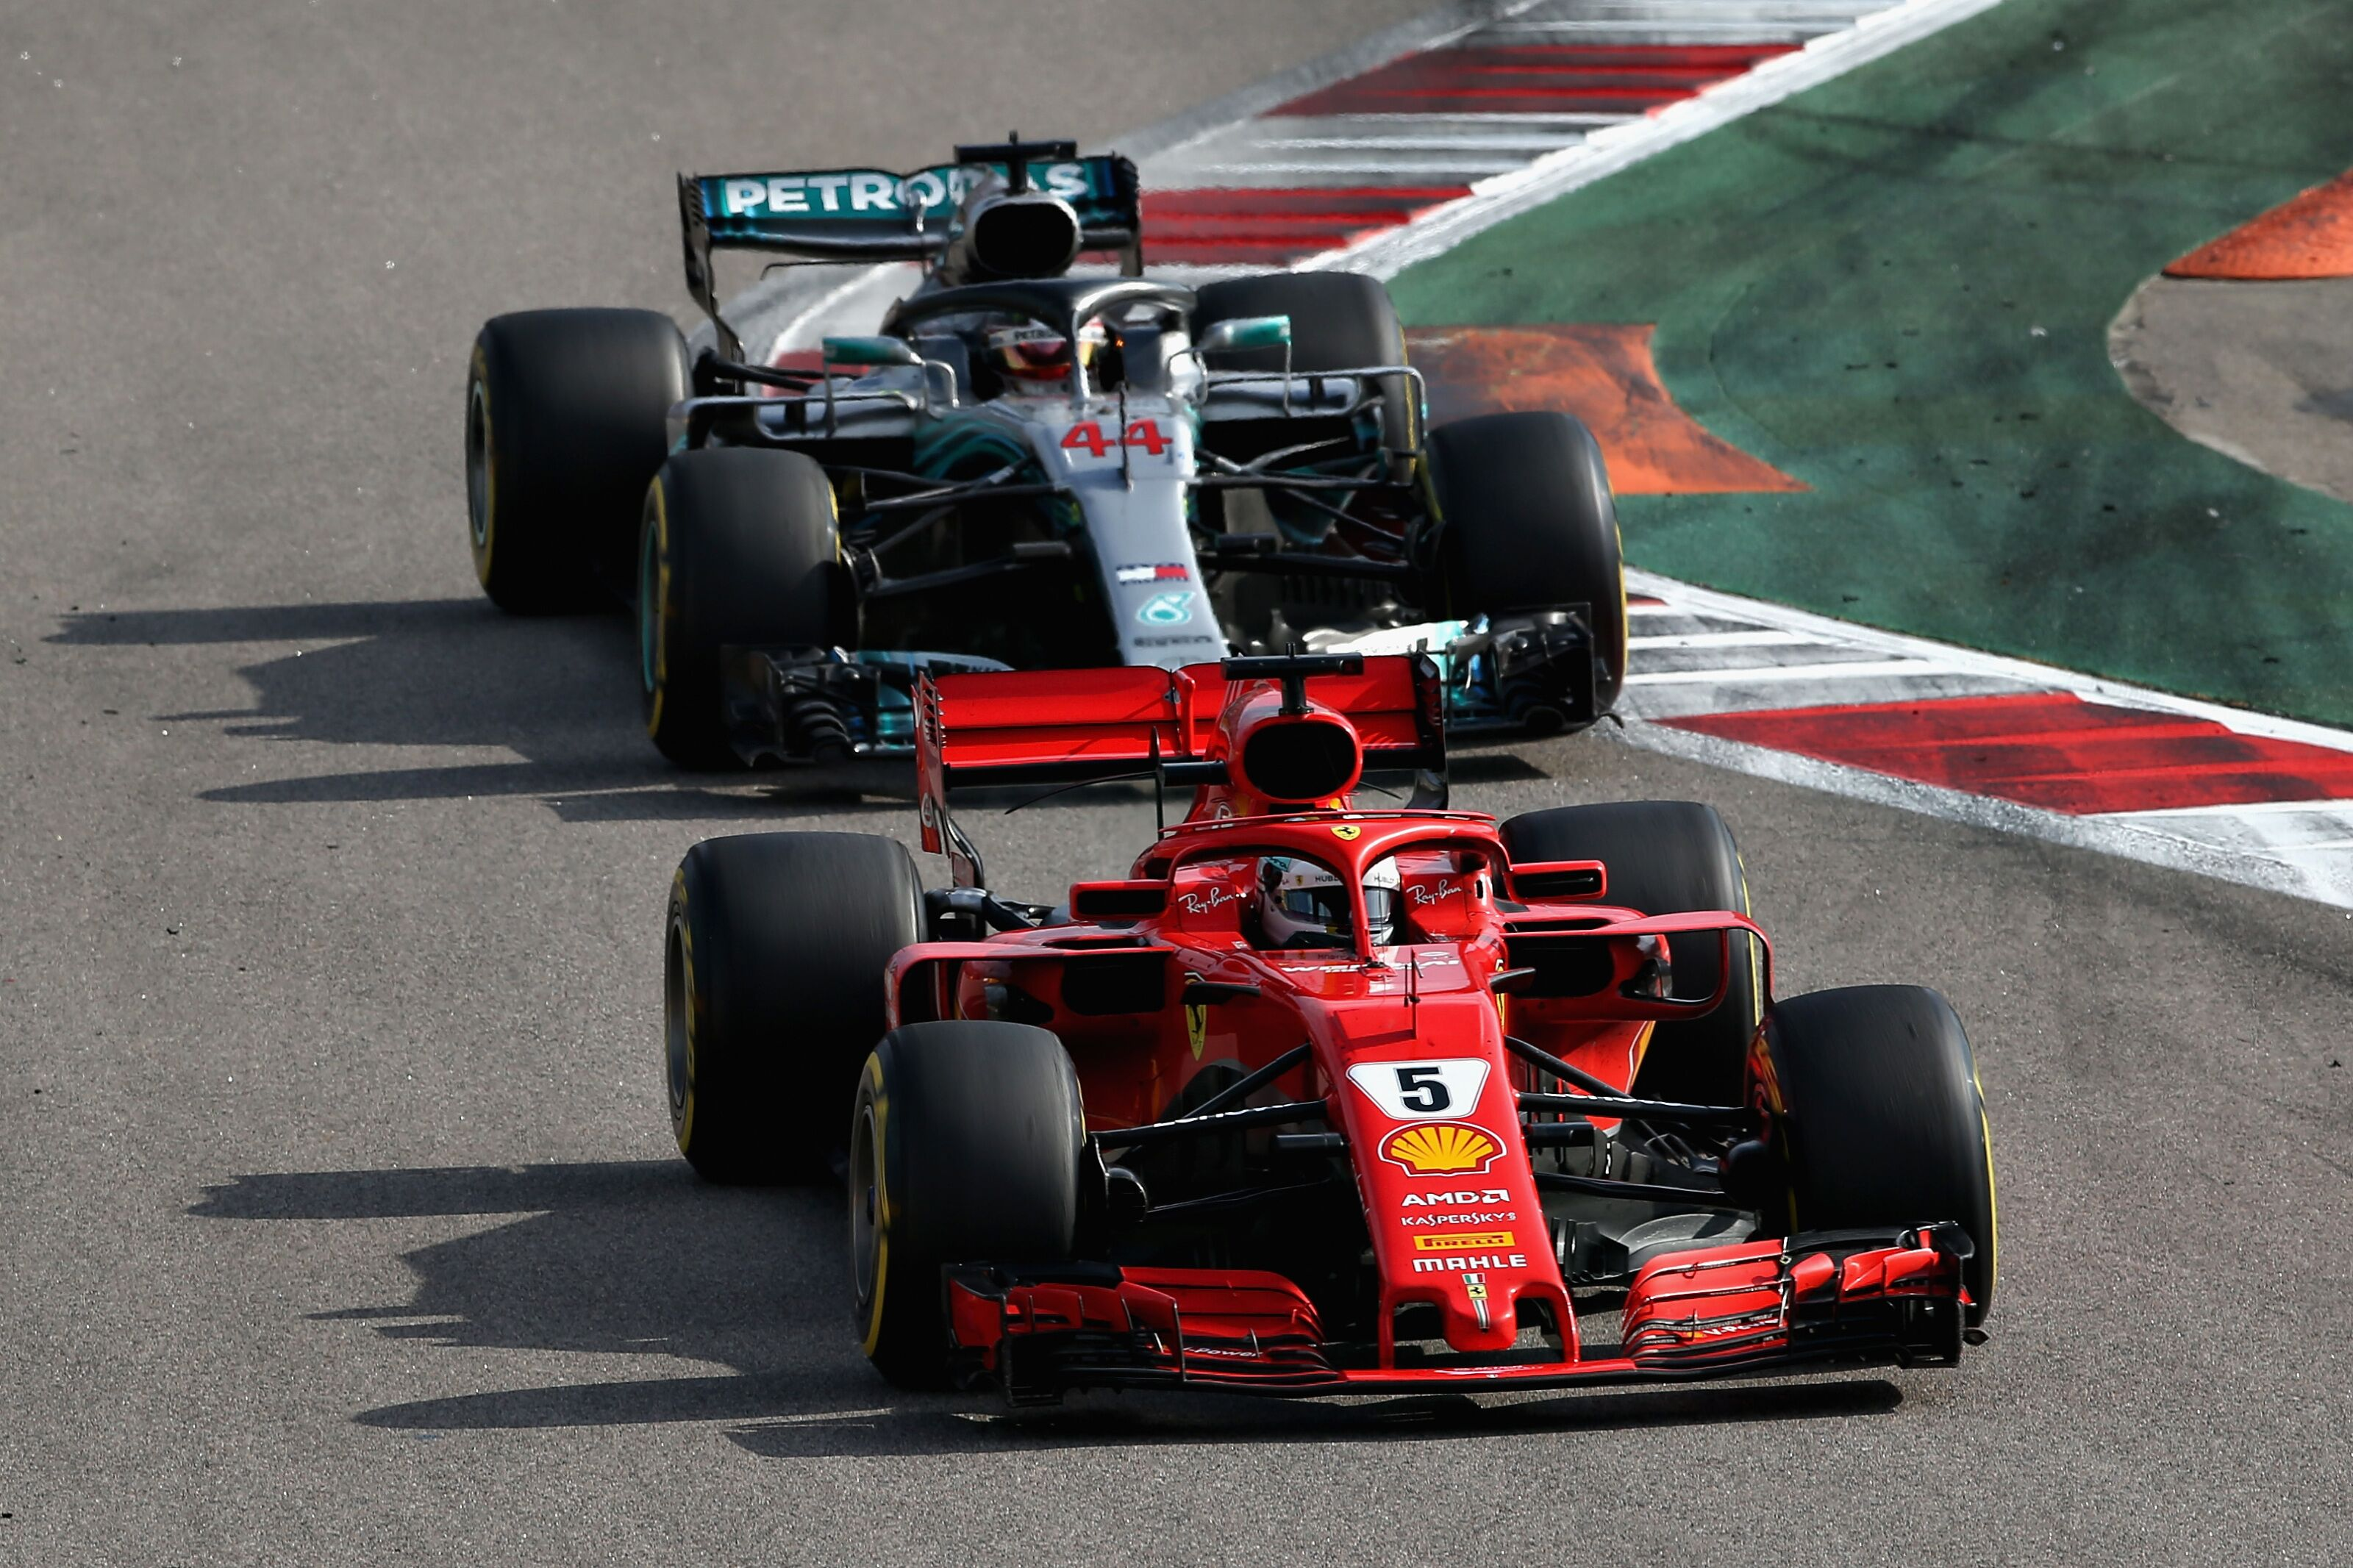 Formula 1 needs a real rivalry, not Lewis Hamilton vs. Sebastian Vettel